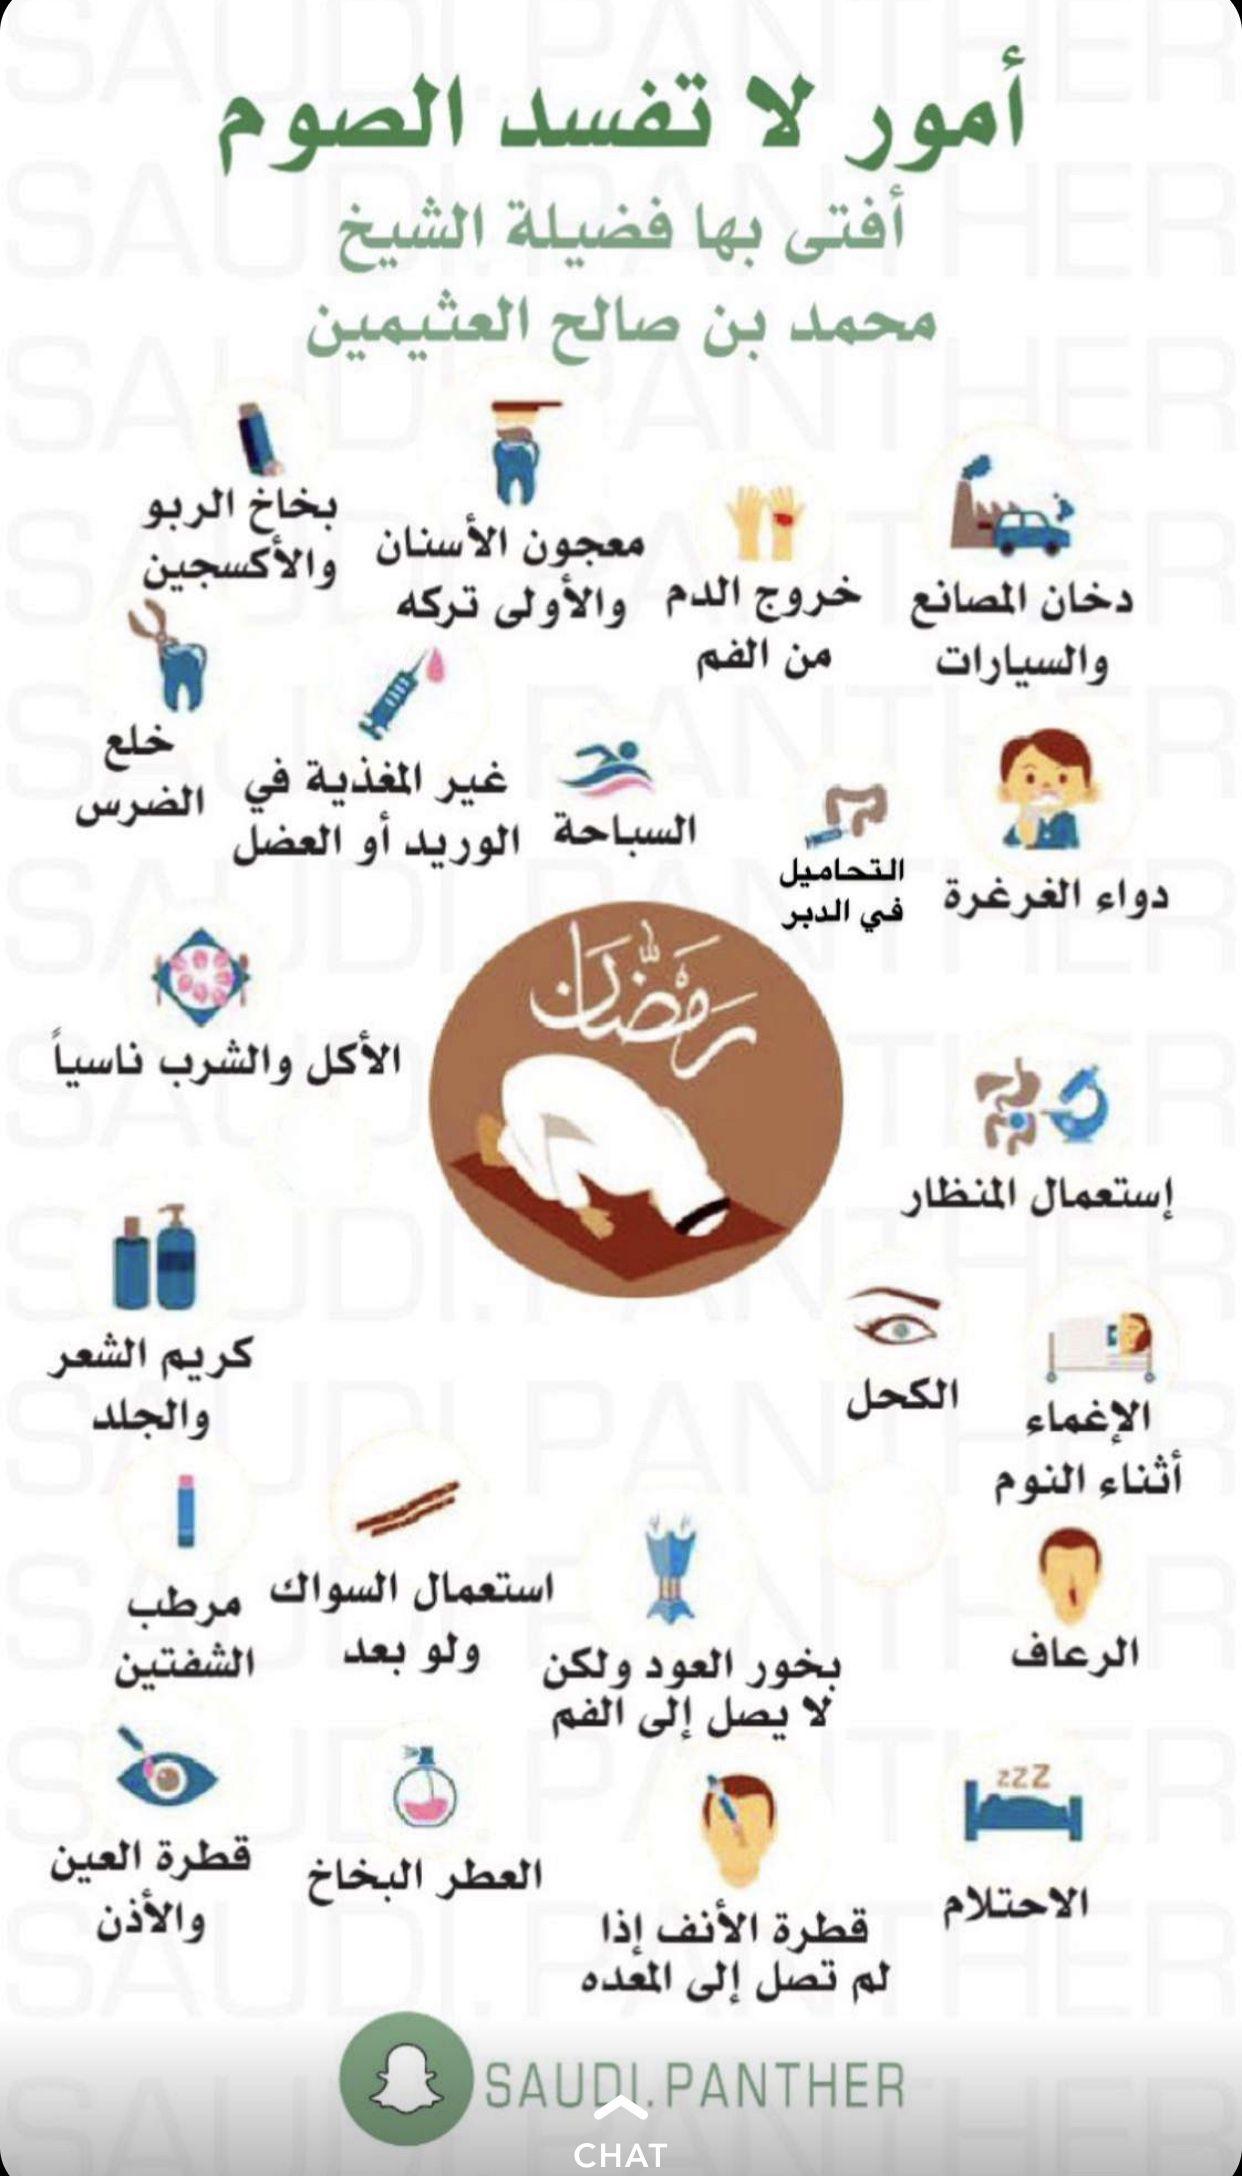 Pin By Nayya Nour On رمضانيات Islam Facts Islam Beliefs Learn Islam